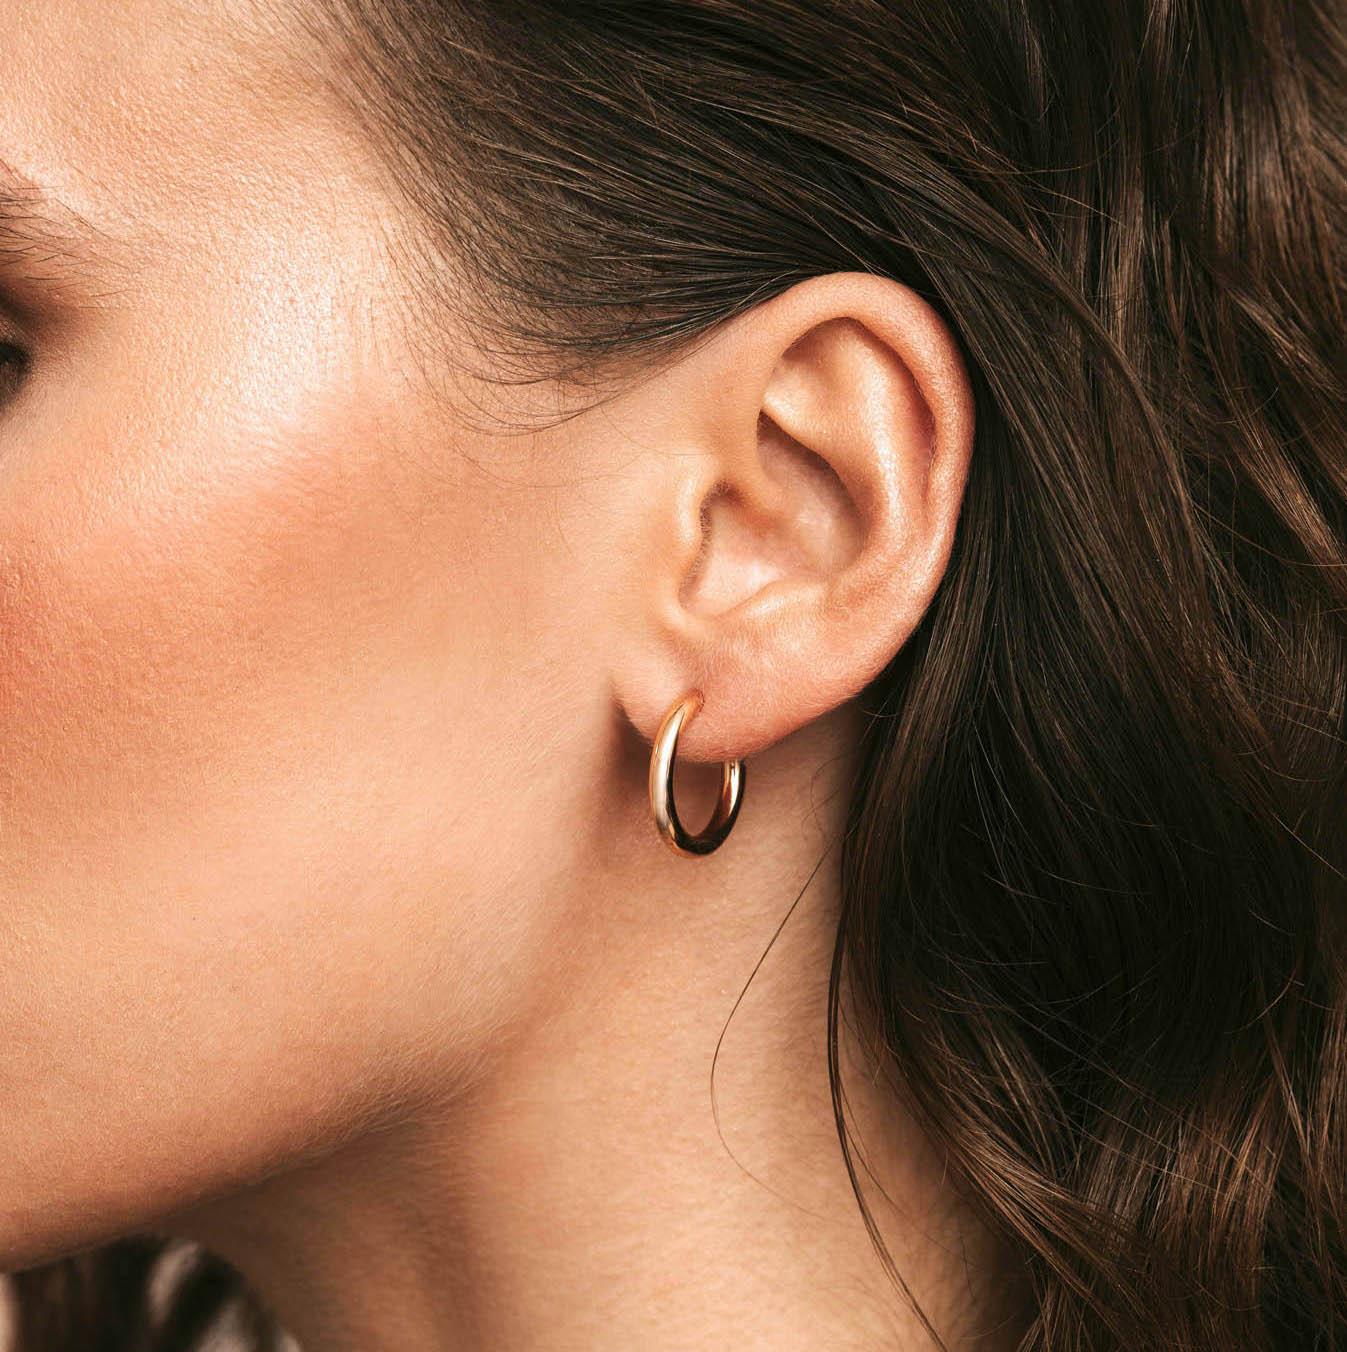 Vacay earrings